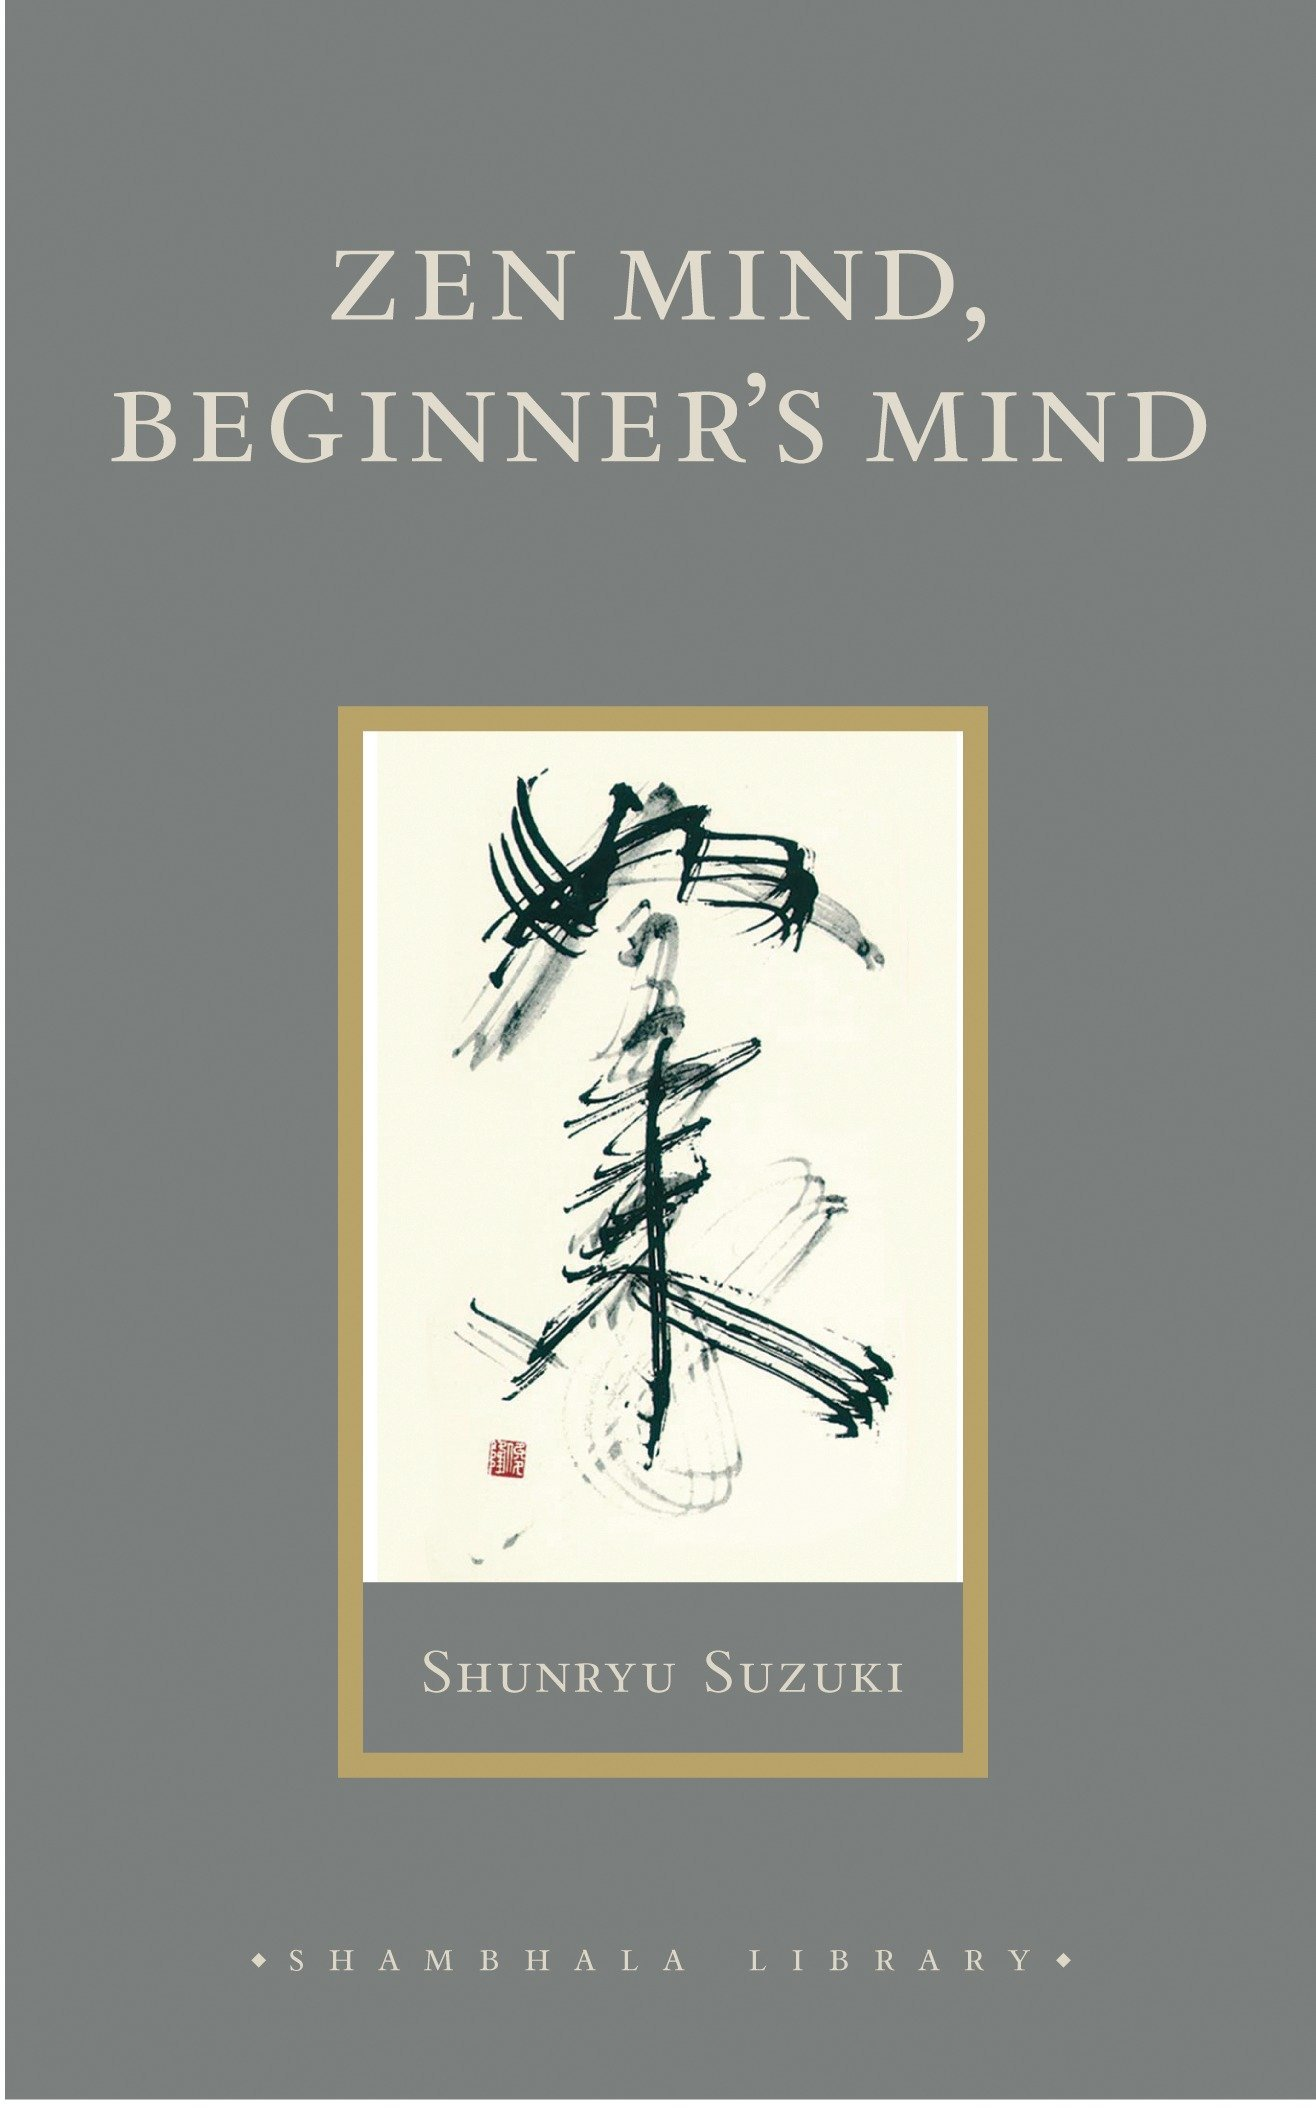 Zen Mind Beginner's Mind  Informal Talks On Zen Meditation And Practice  Shambhala Library